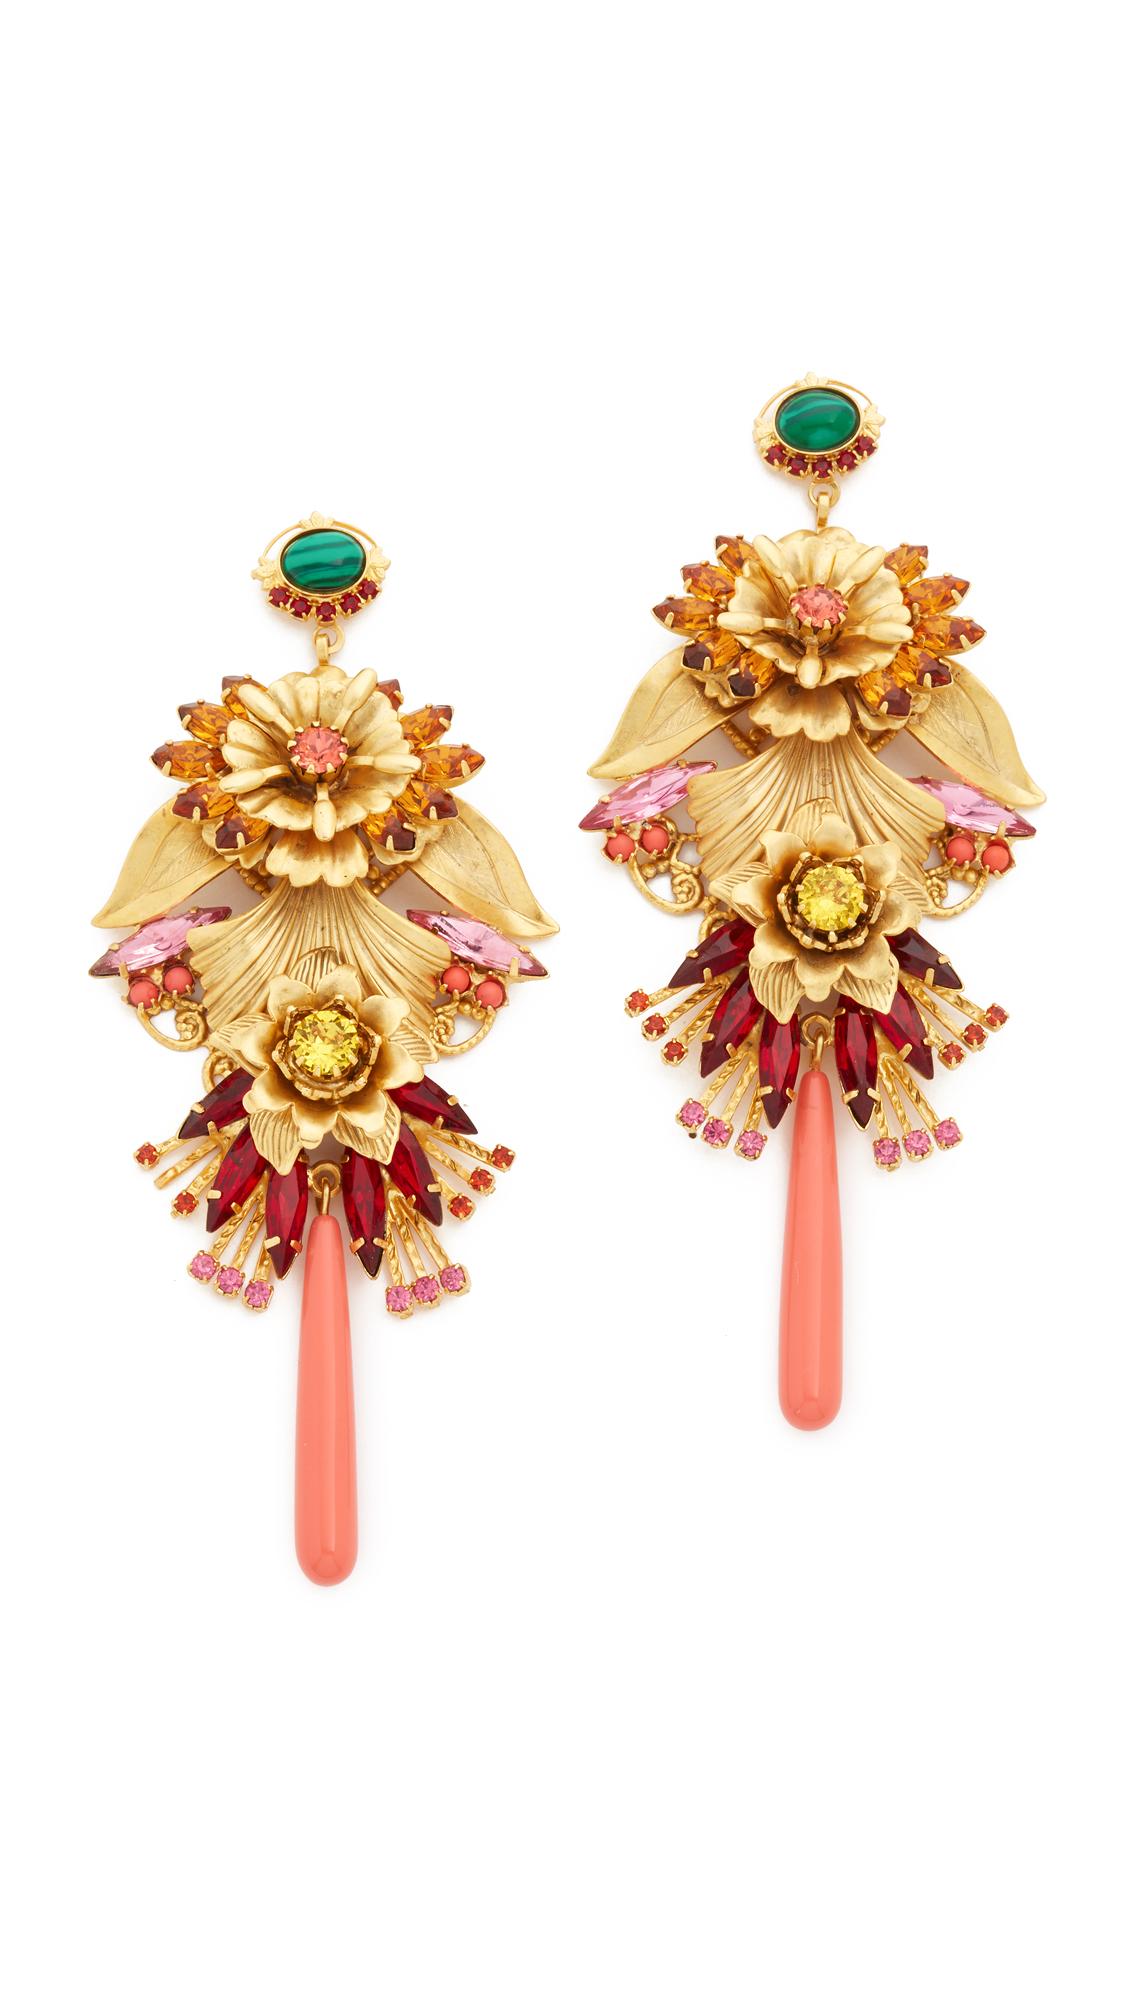 Elizabeth Cole Embellished Sunny Ruby Earrings